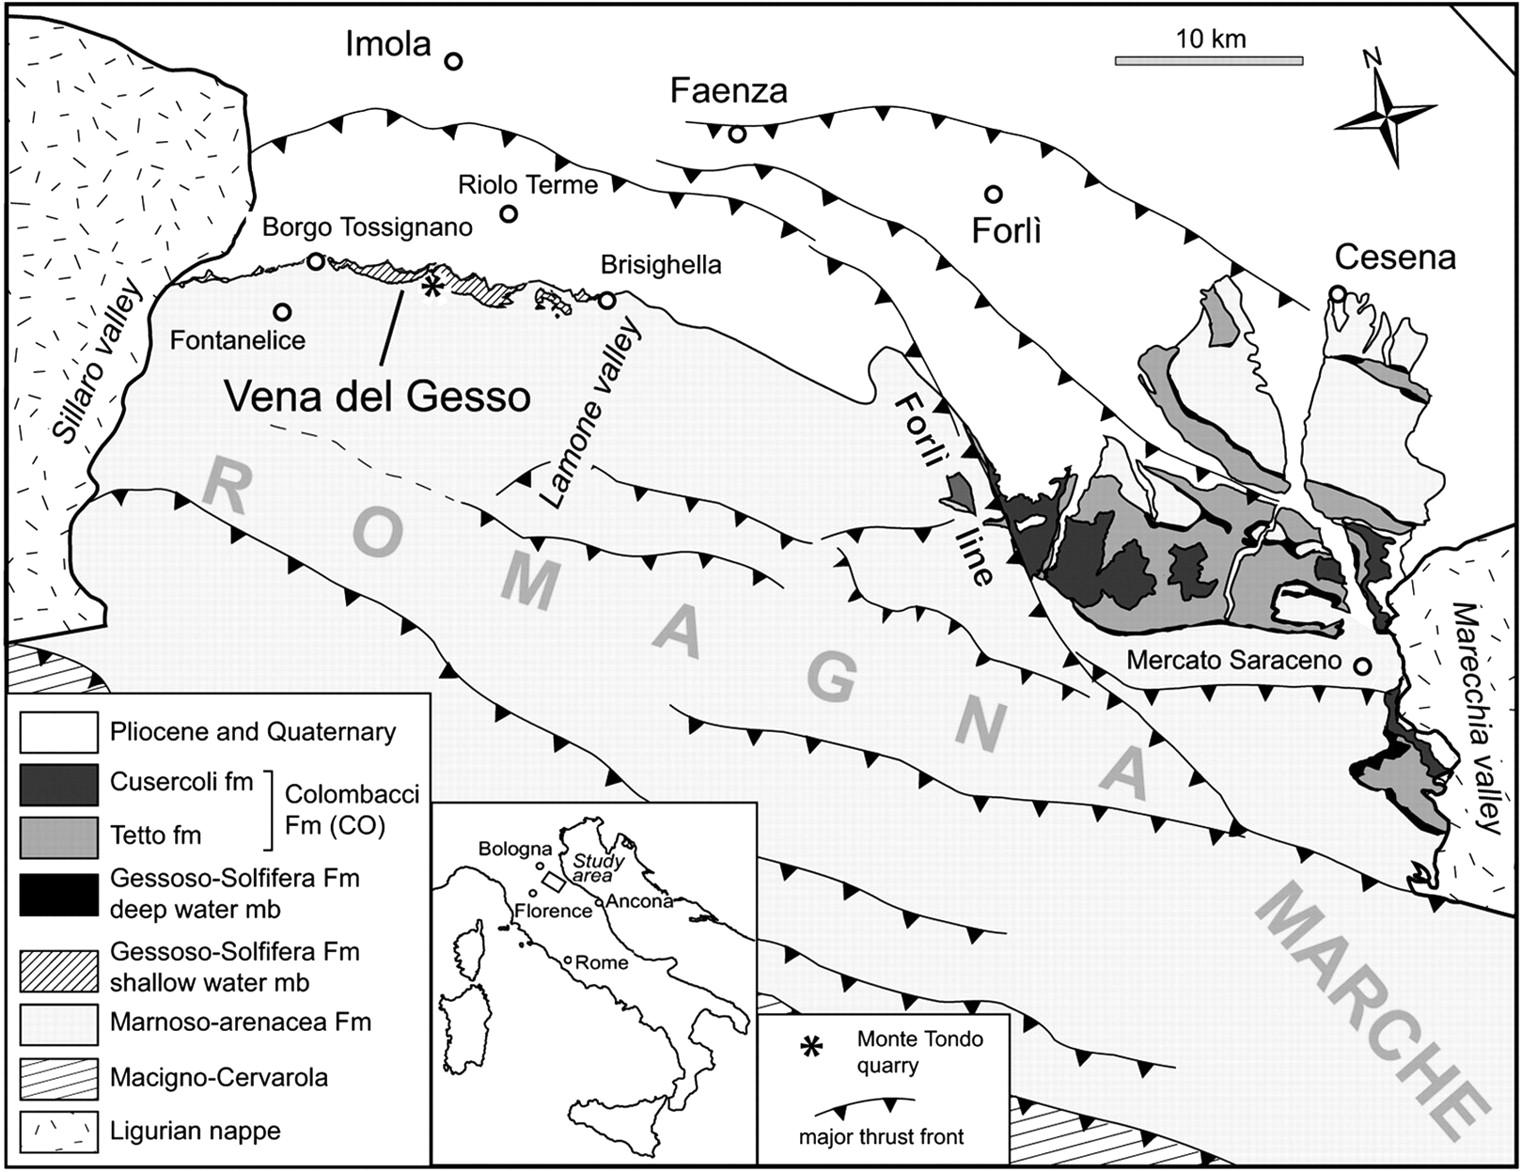 Ancient Basins Evaporites Through Space And Time Geoscienceworld Rvnet Open Roads Forum Fifthwheels Plumbing Schematics View Largedownload Slide